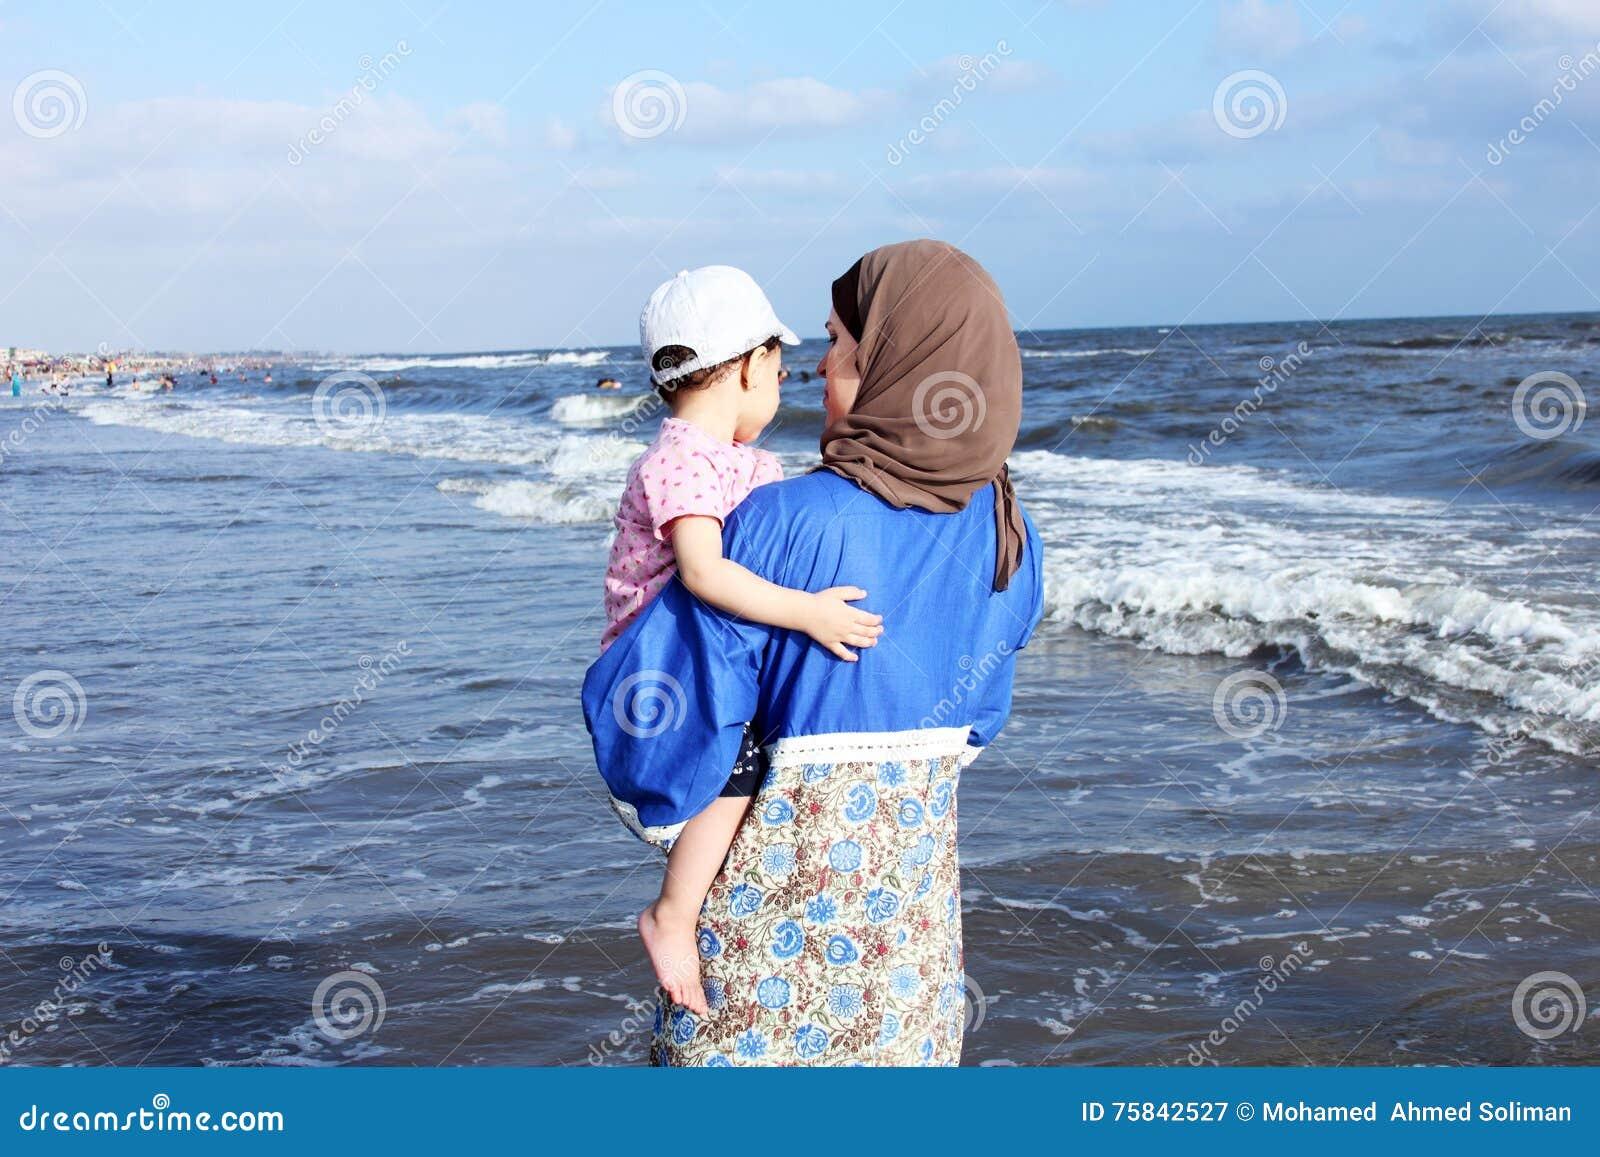 Arab egyptian muslim mother holding her baby girl on beach in egypt